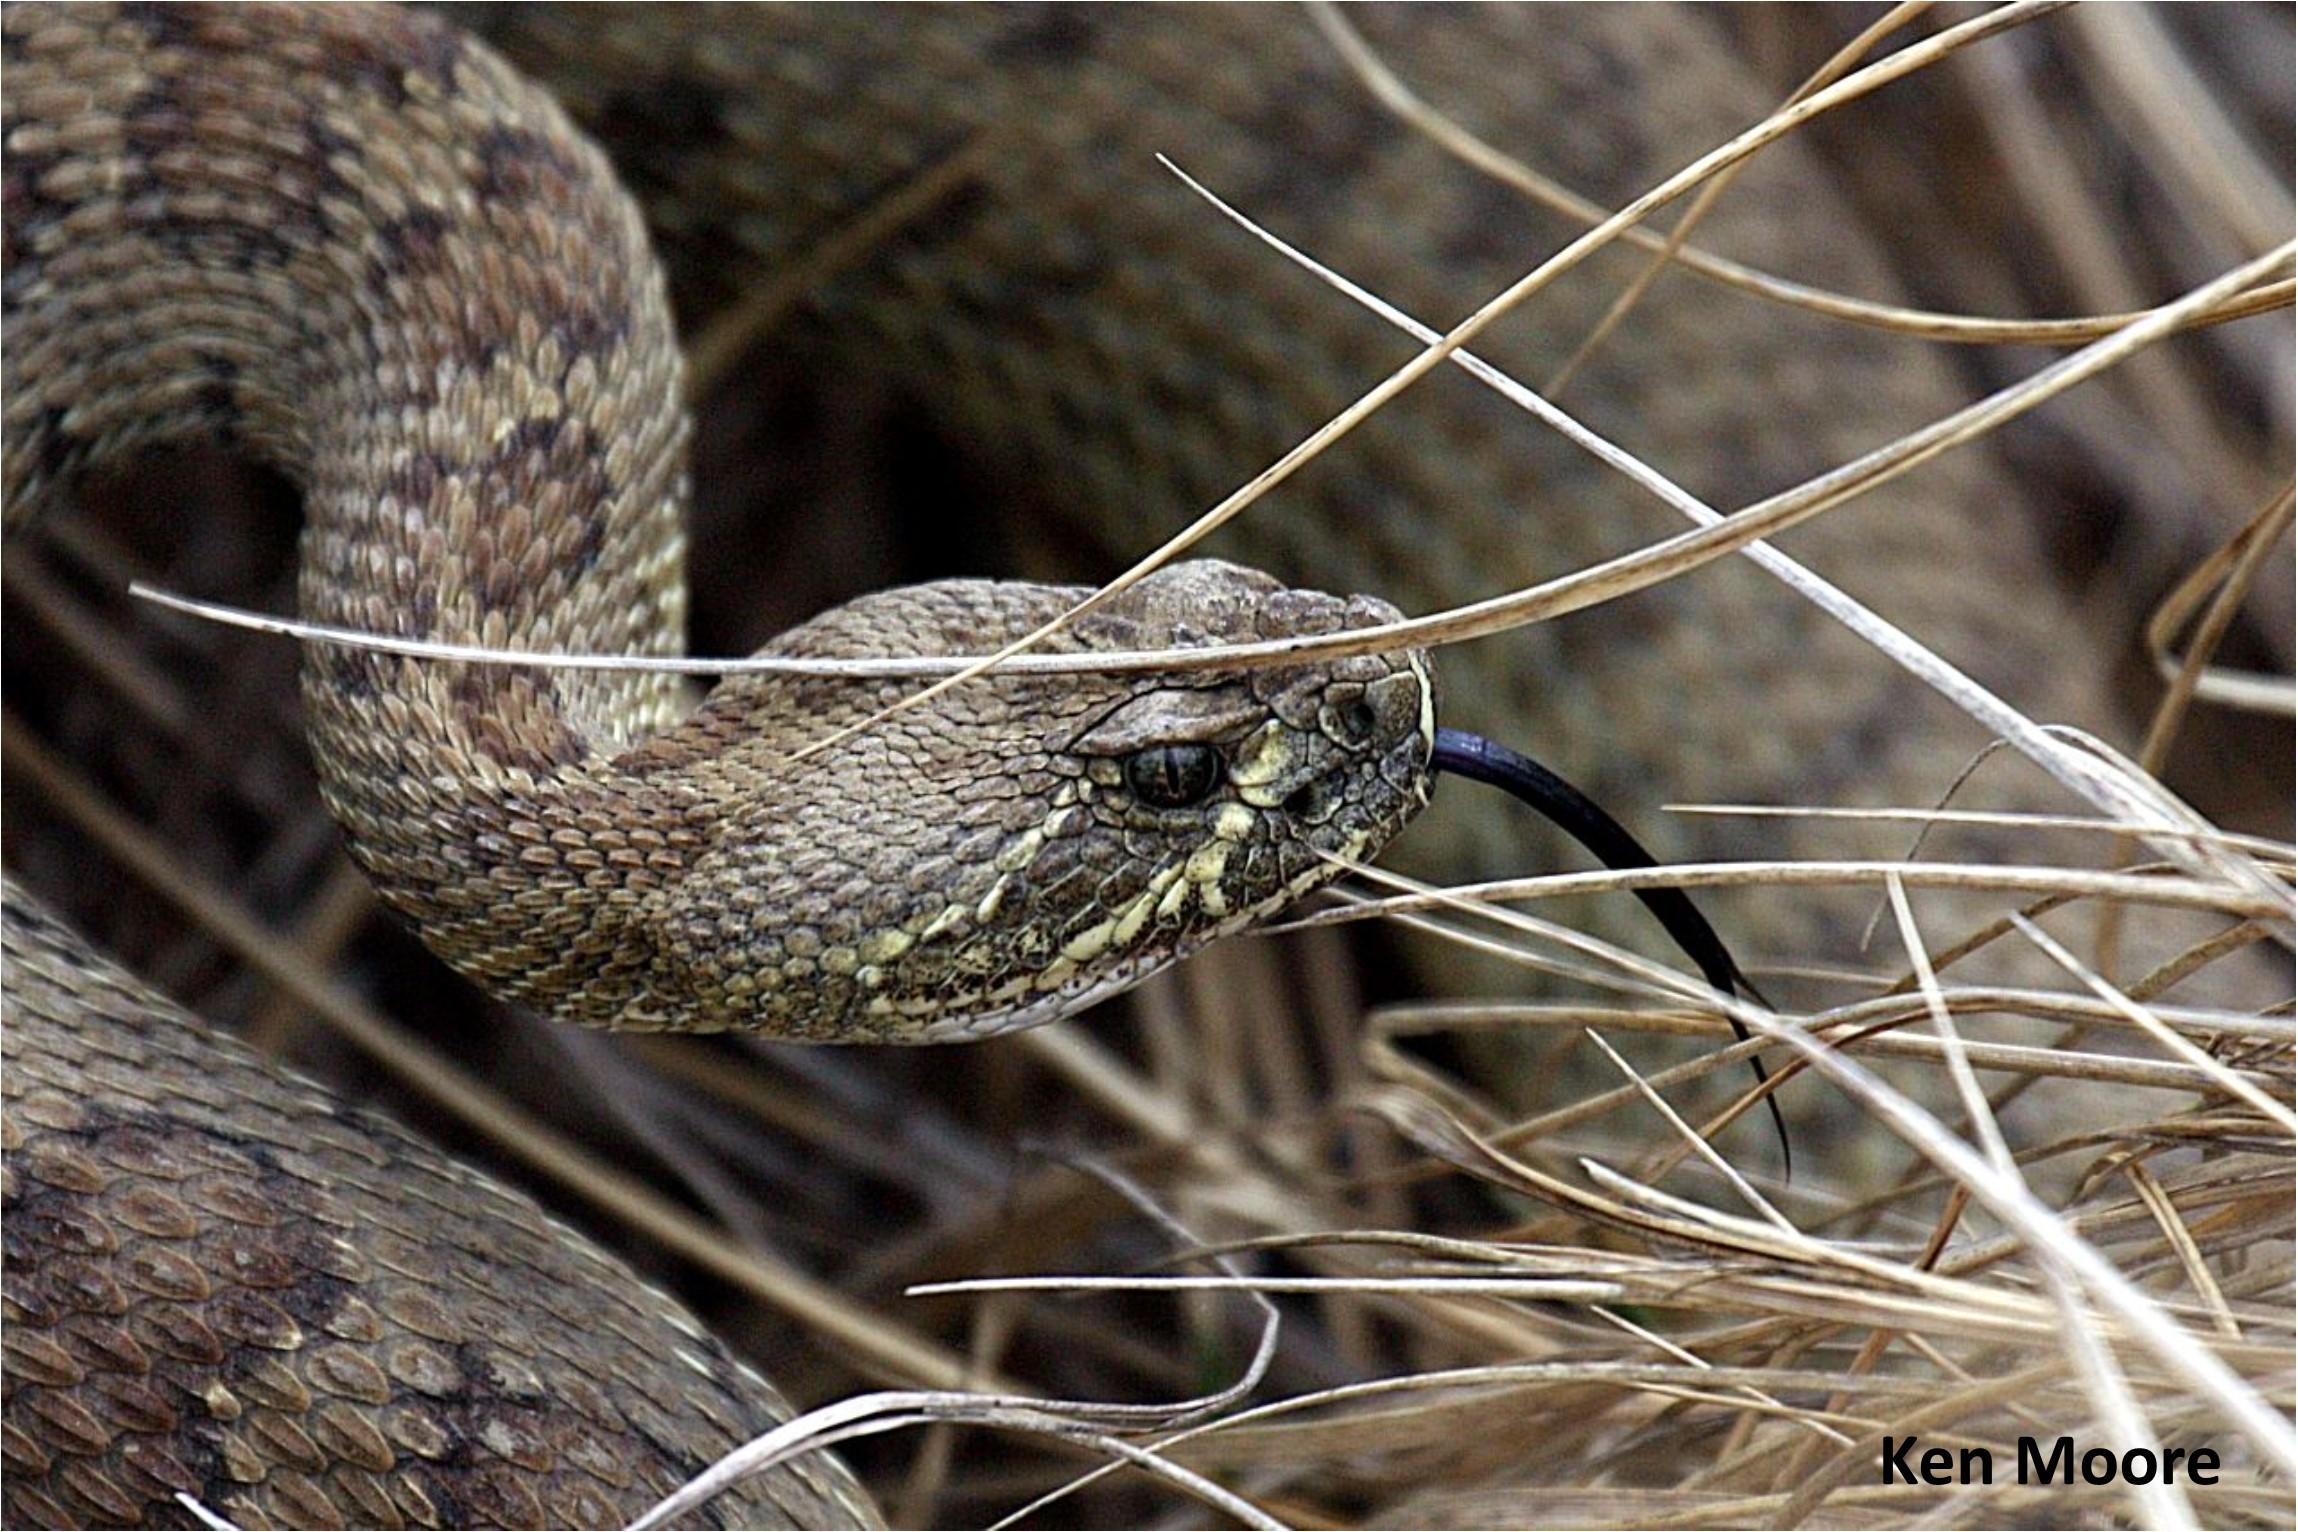 Rattlesnake photo credit Ken Moore.jpg